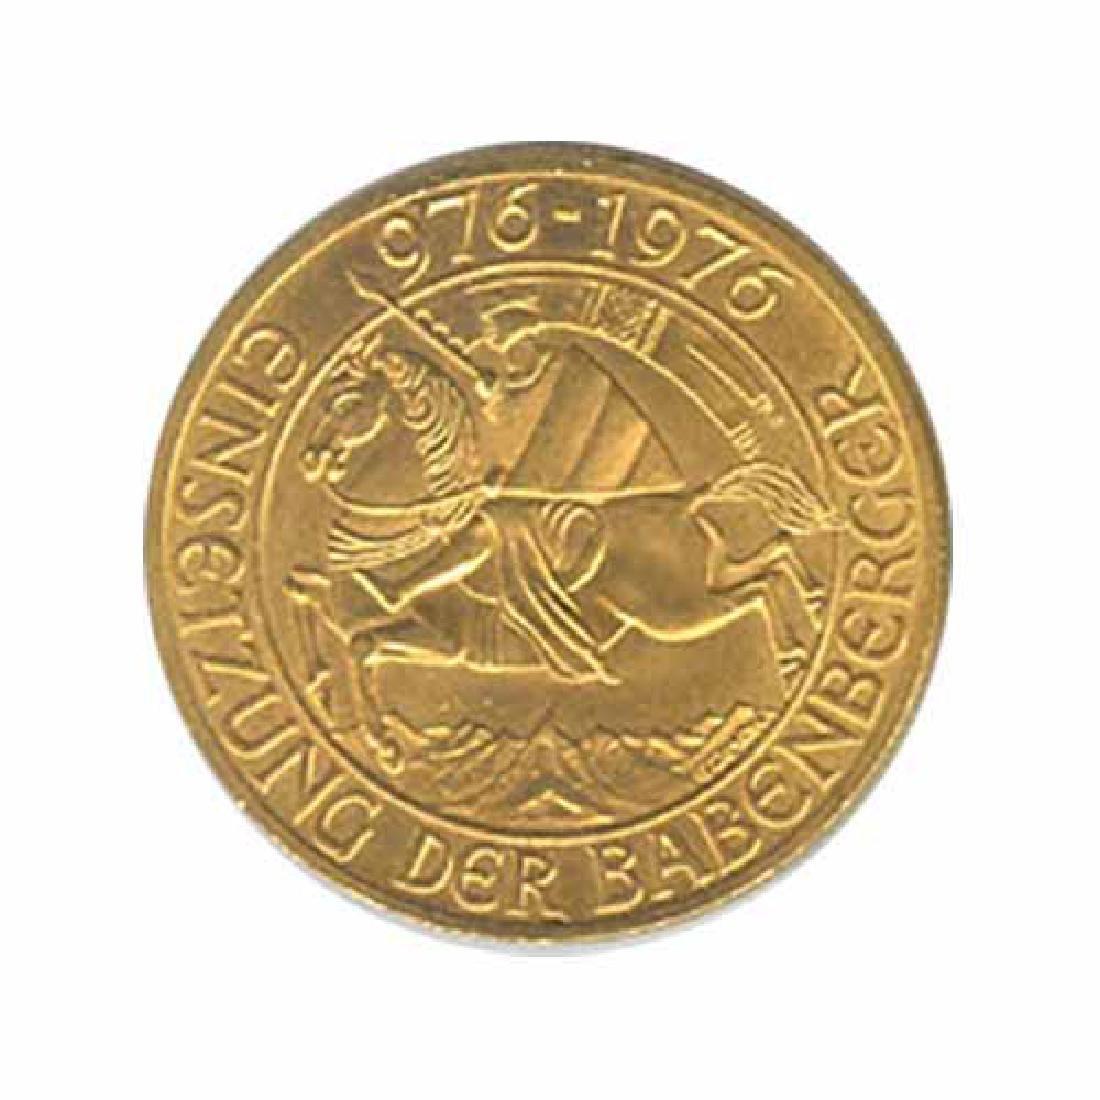 Austria gold 1000 schilling 1976 Babenburg Dynasty